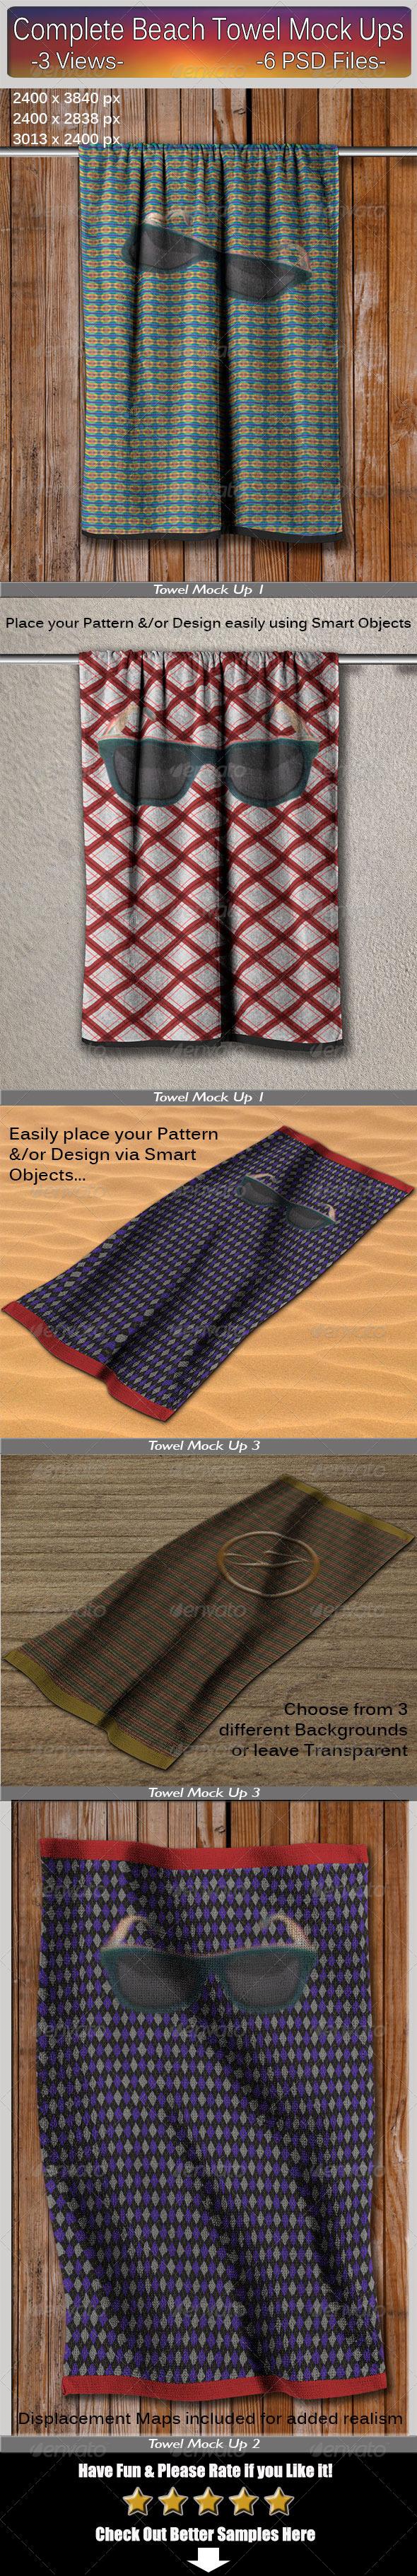 GraphicRiver Complete Beach Towel Mock Ups 7786860